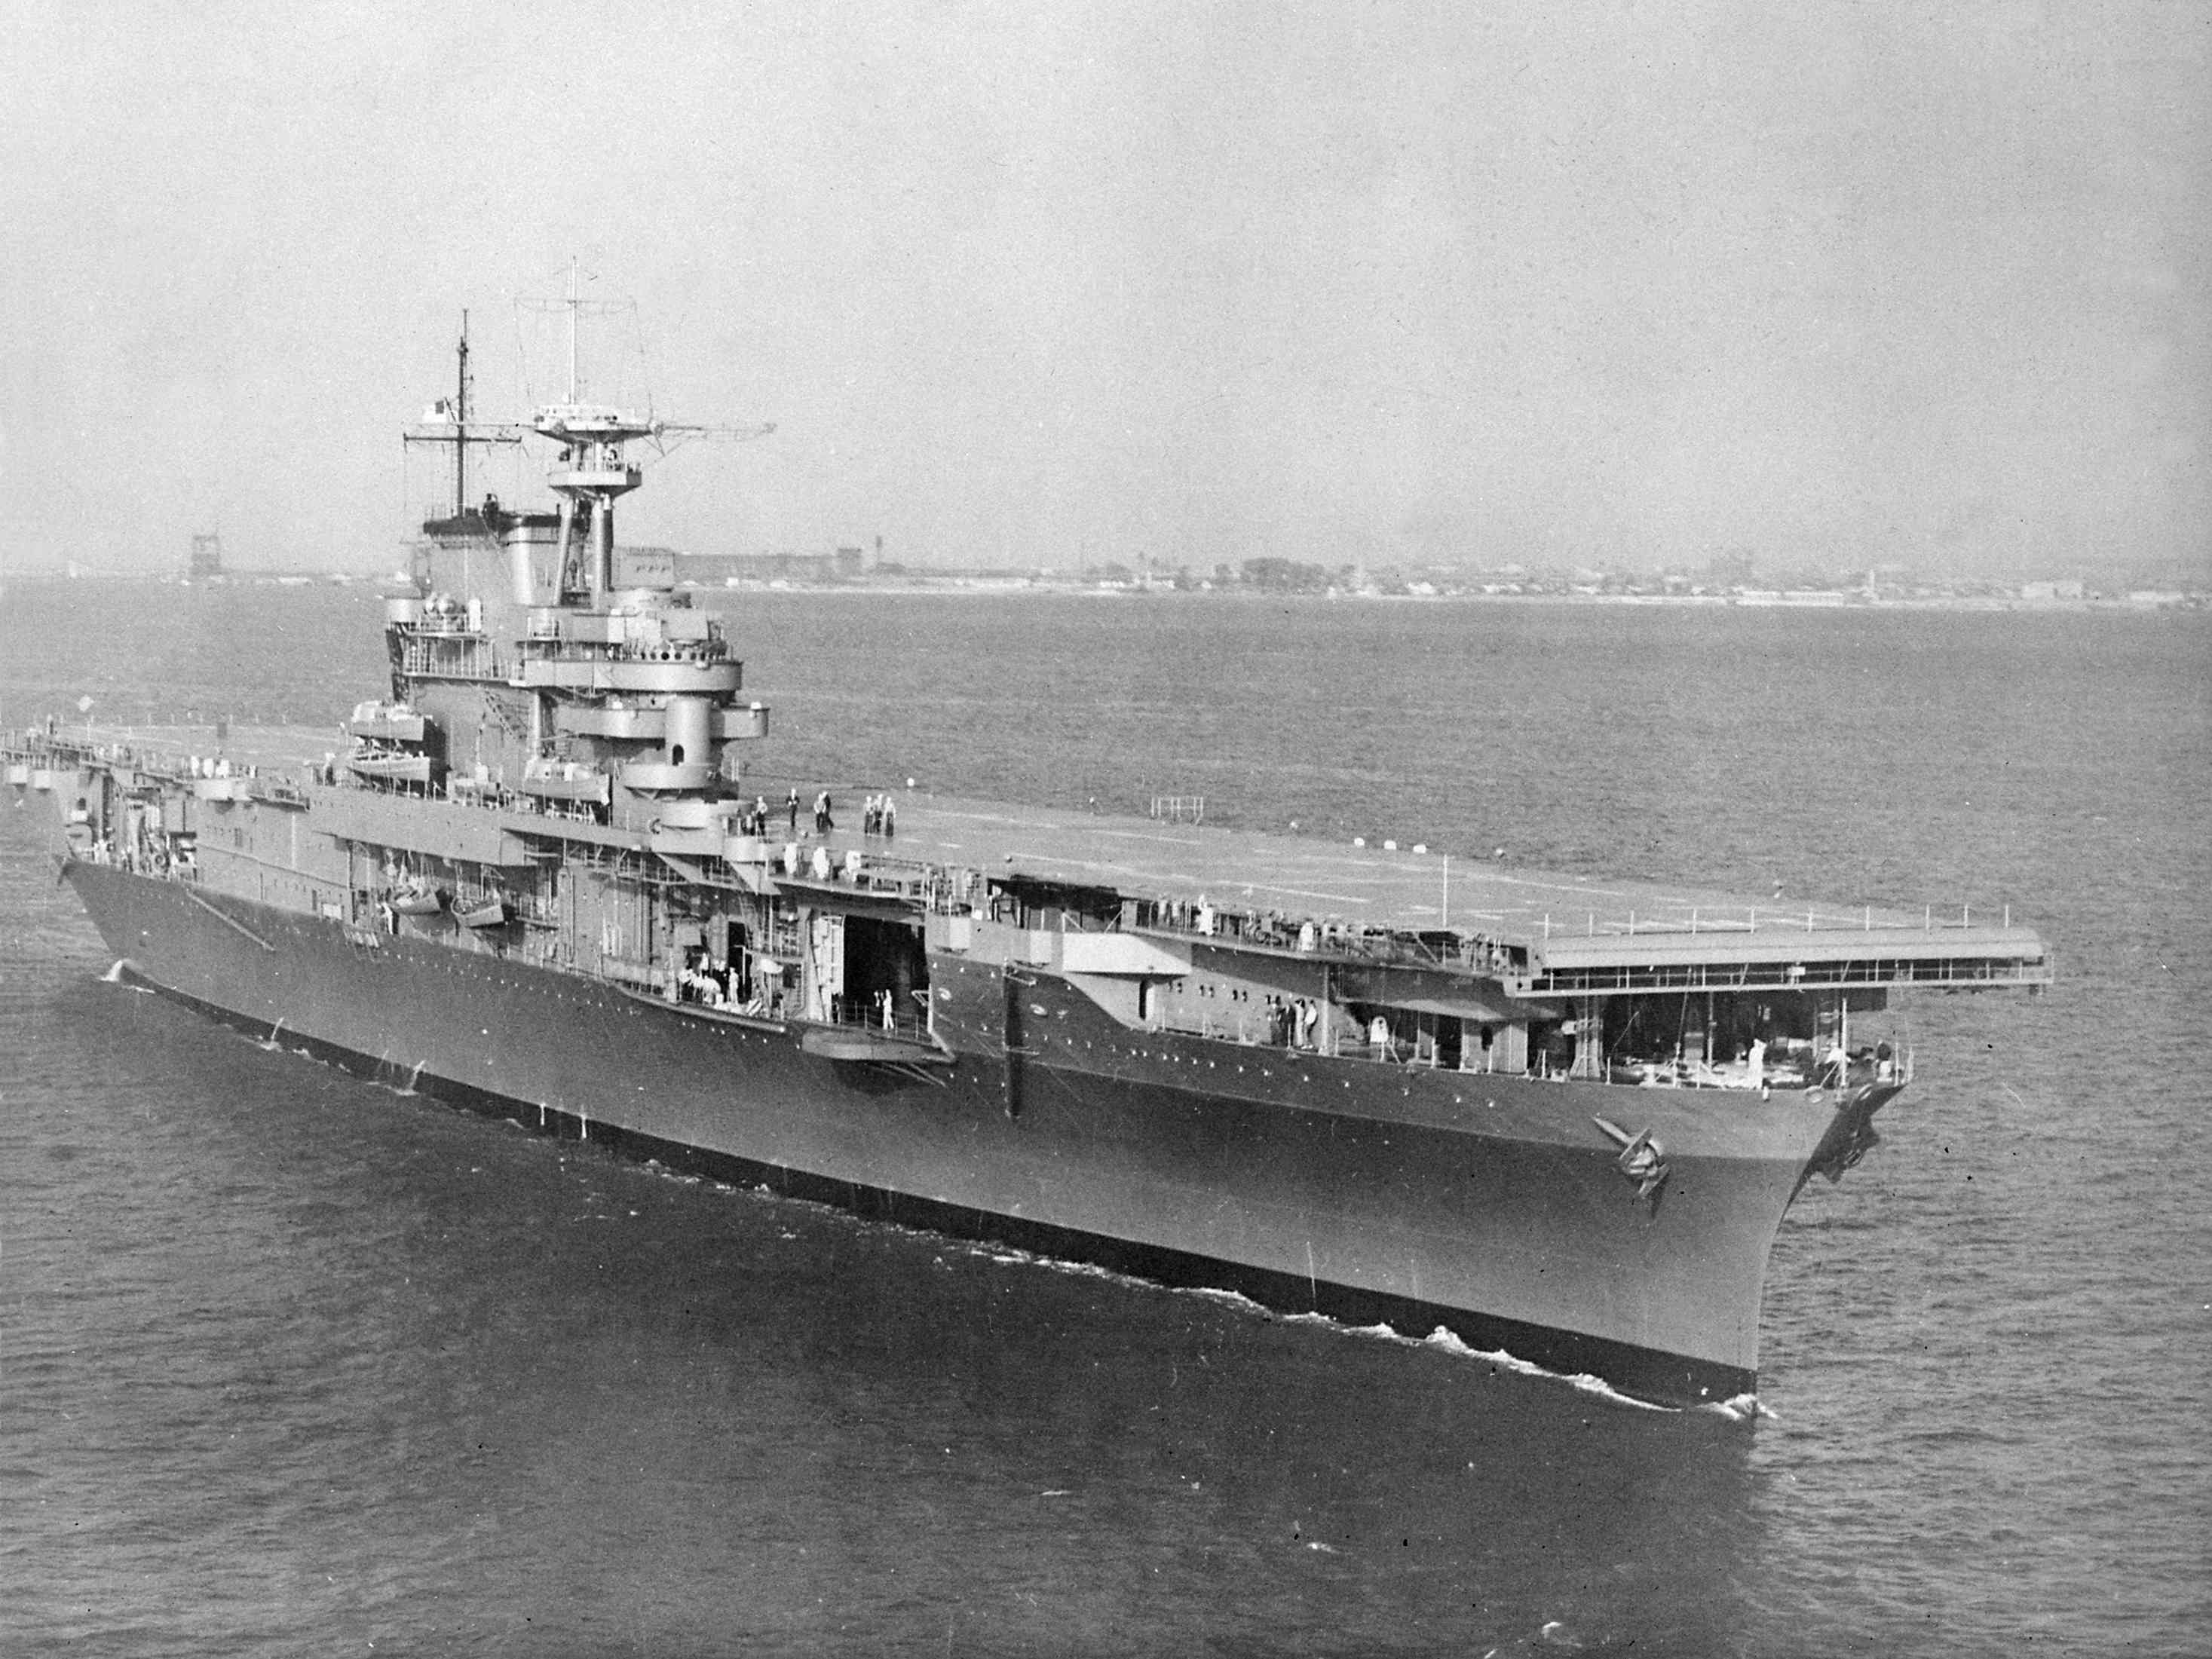 Aircraft carrier USS Hornet (CV-8) underway in the Chesapeake Bay.